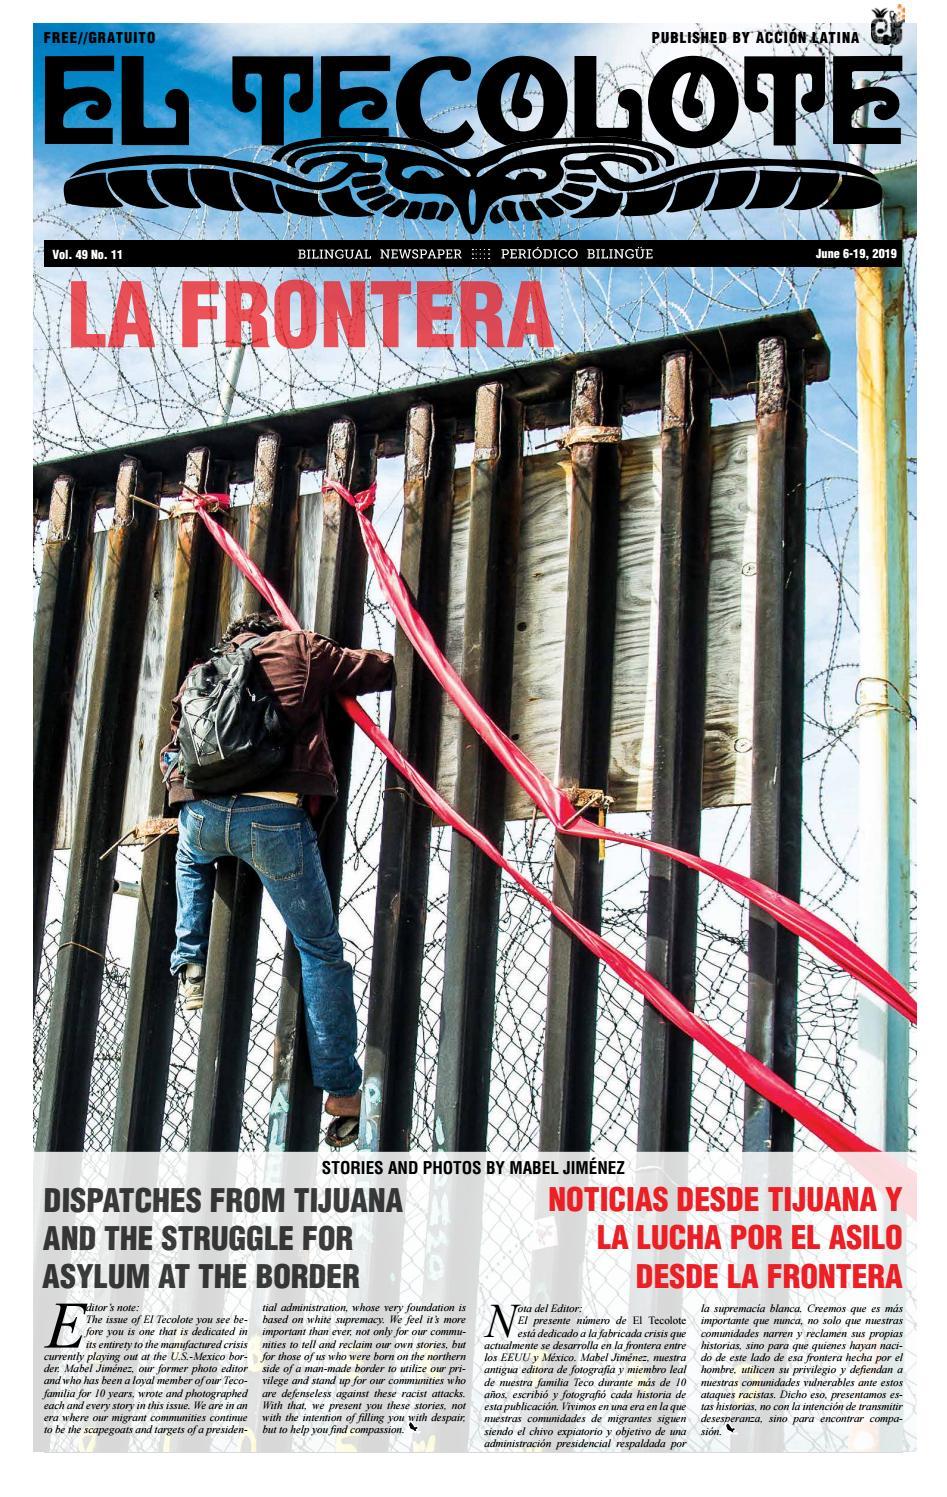 El Tecolote Vol 49 Issue 11 By El Tecolote Issuu